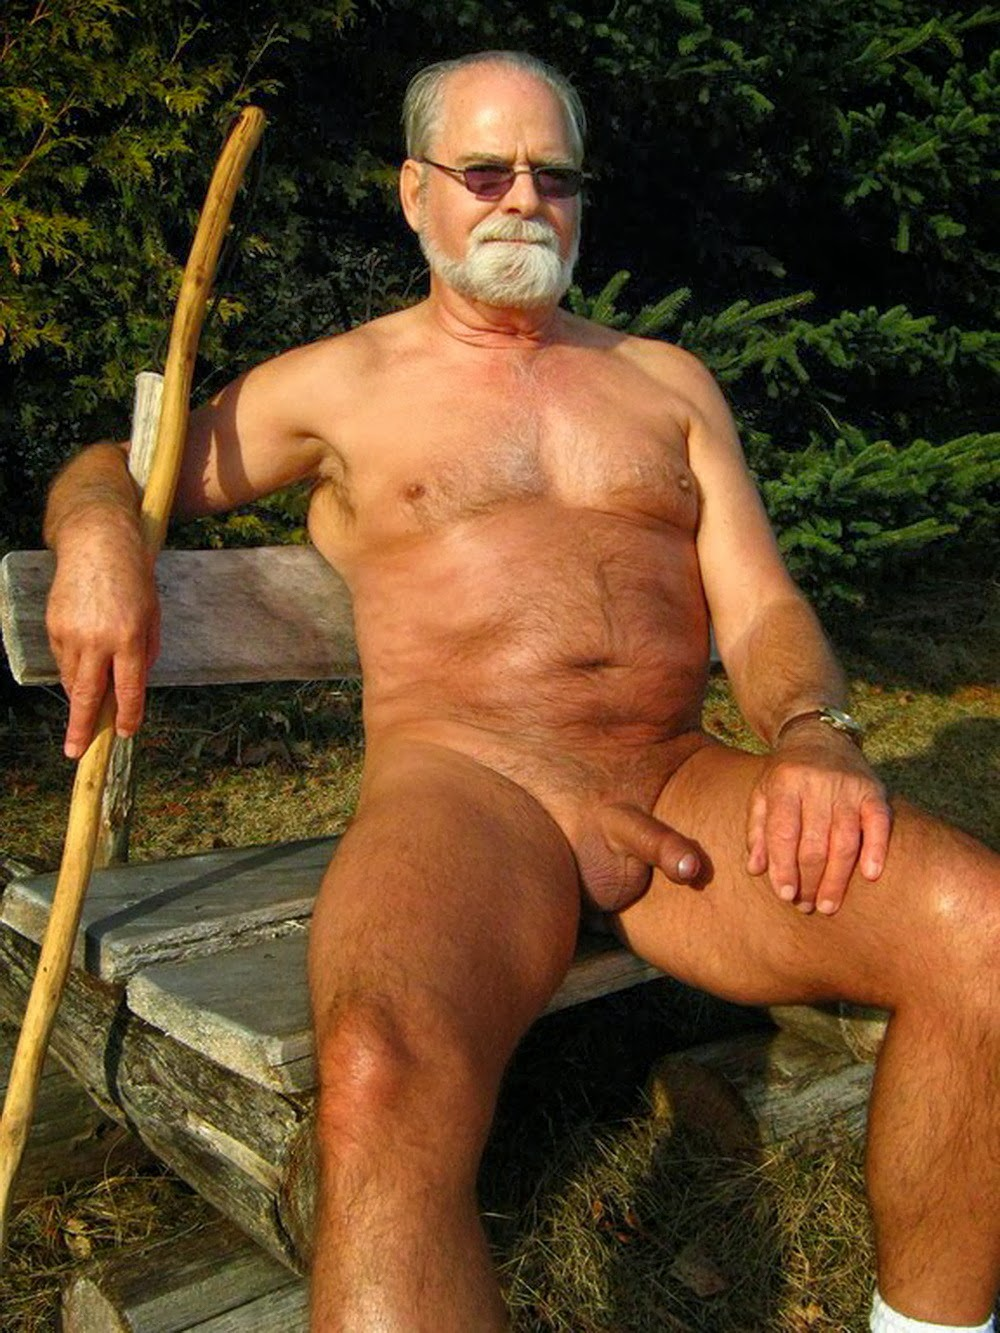 Grandpa Boner